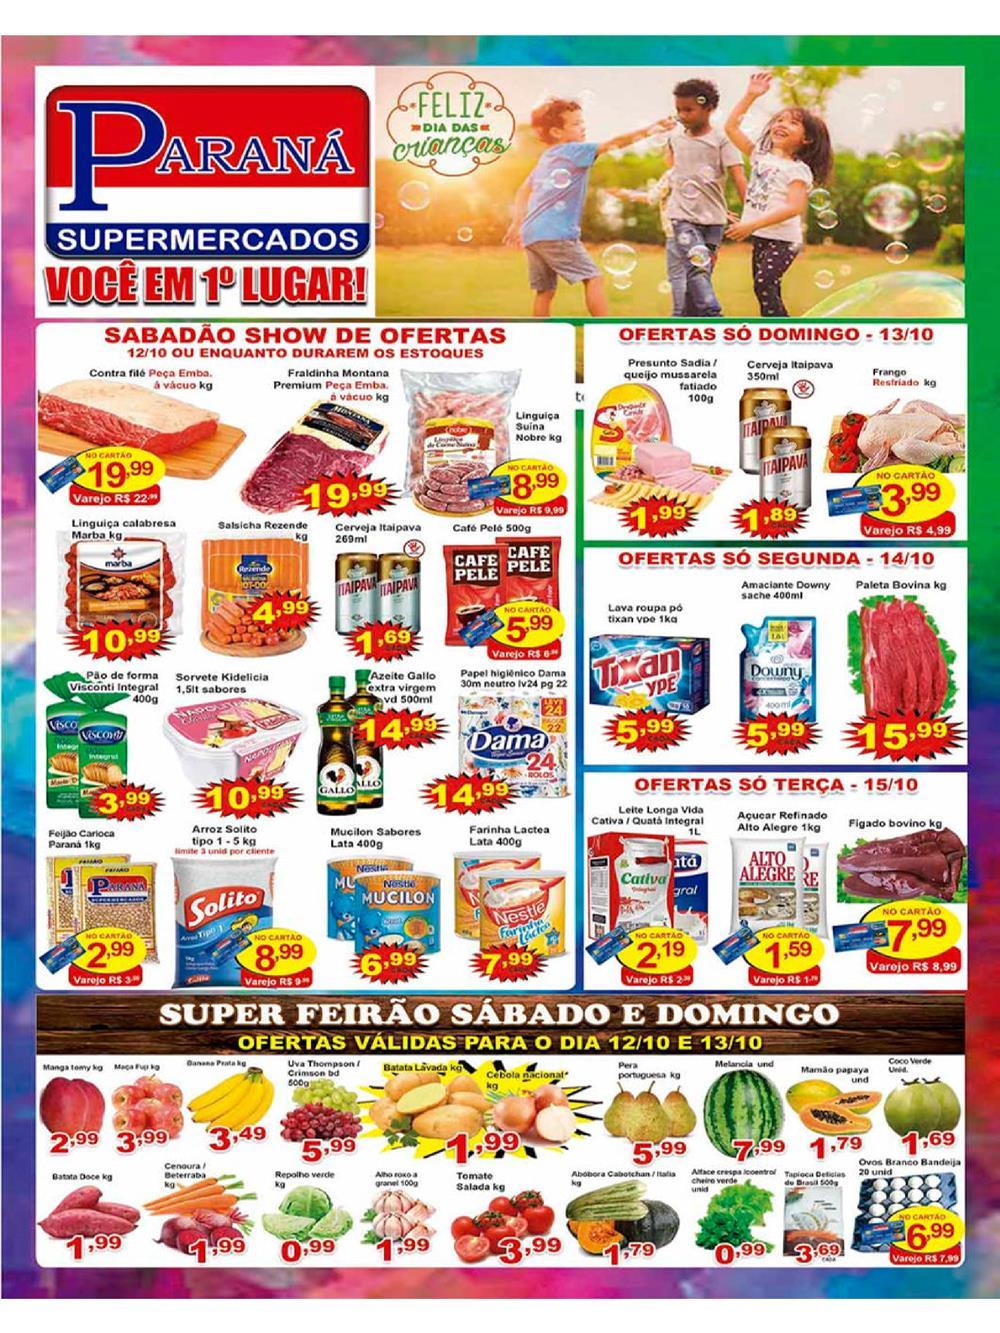 PARANA-Ofertas-Tabloide1 Ofertas de supermercados - Black Friday 2019